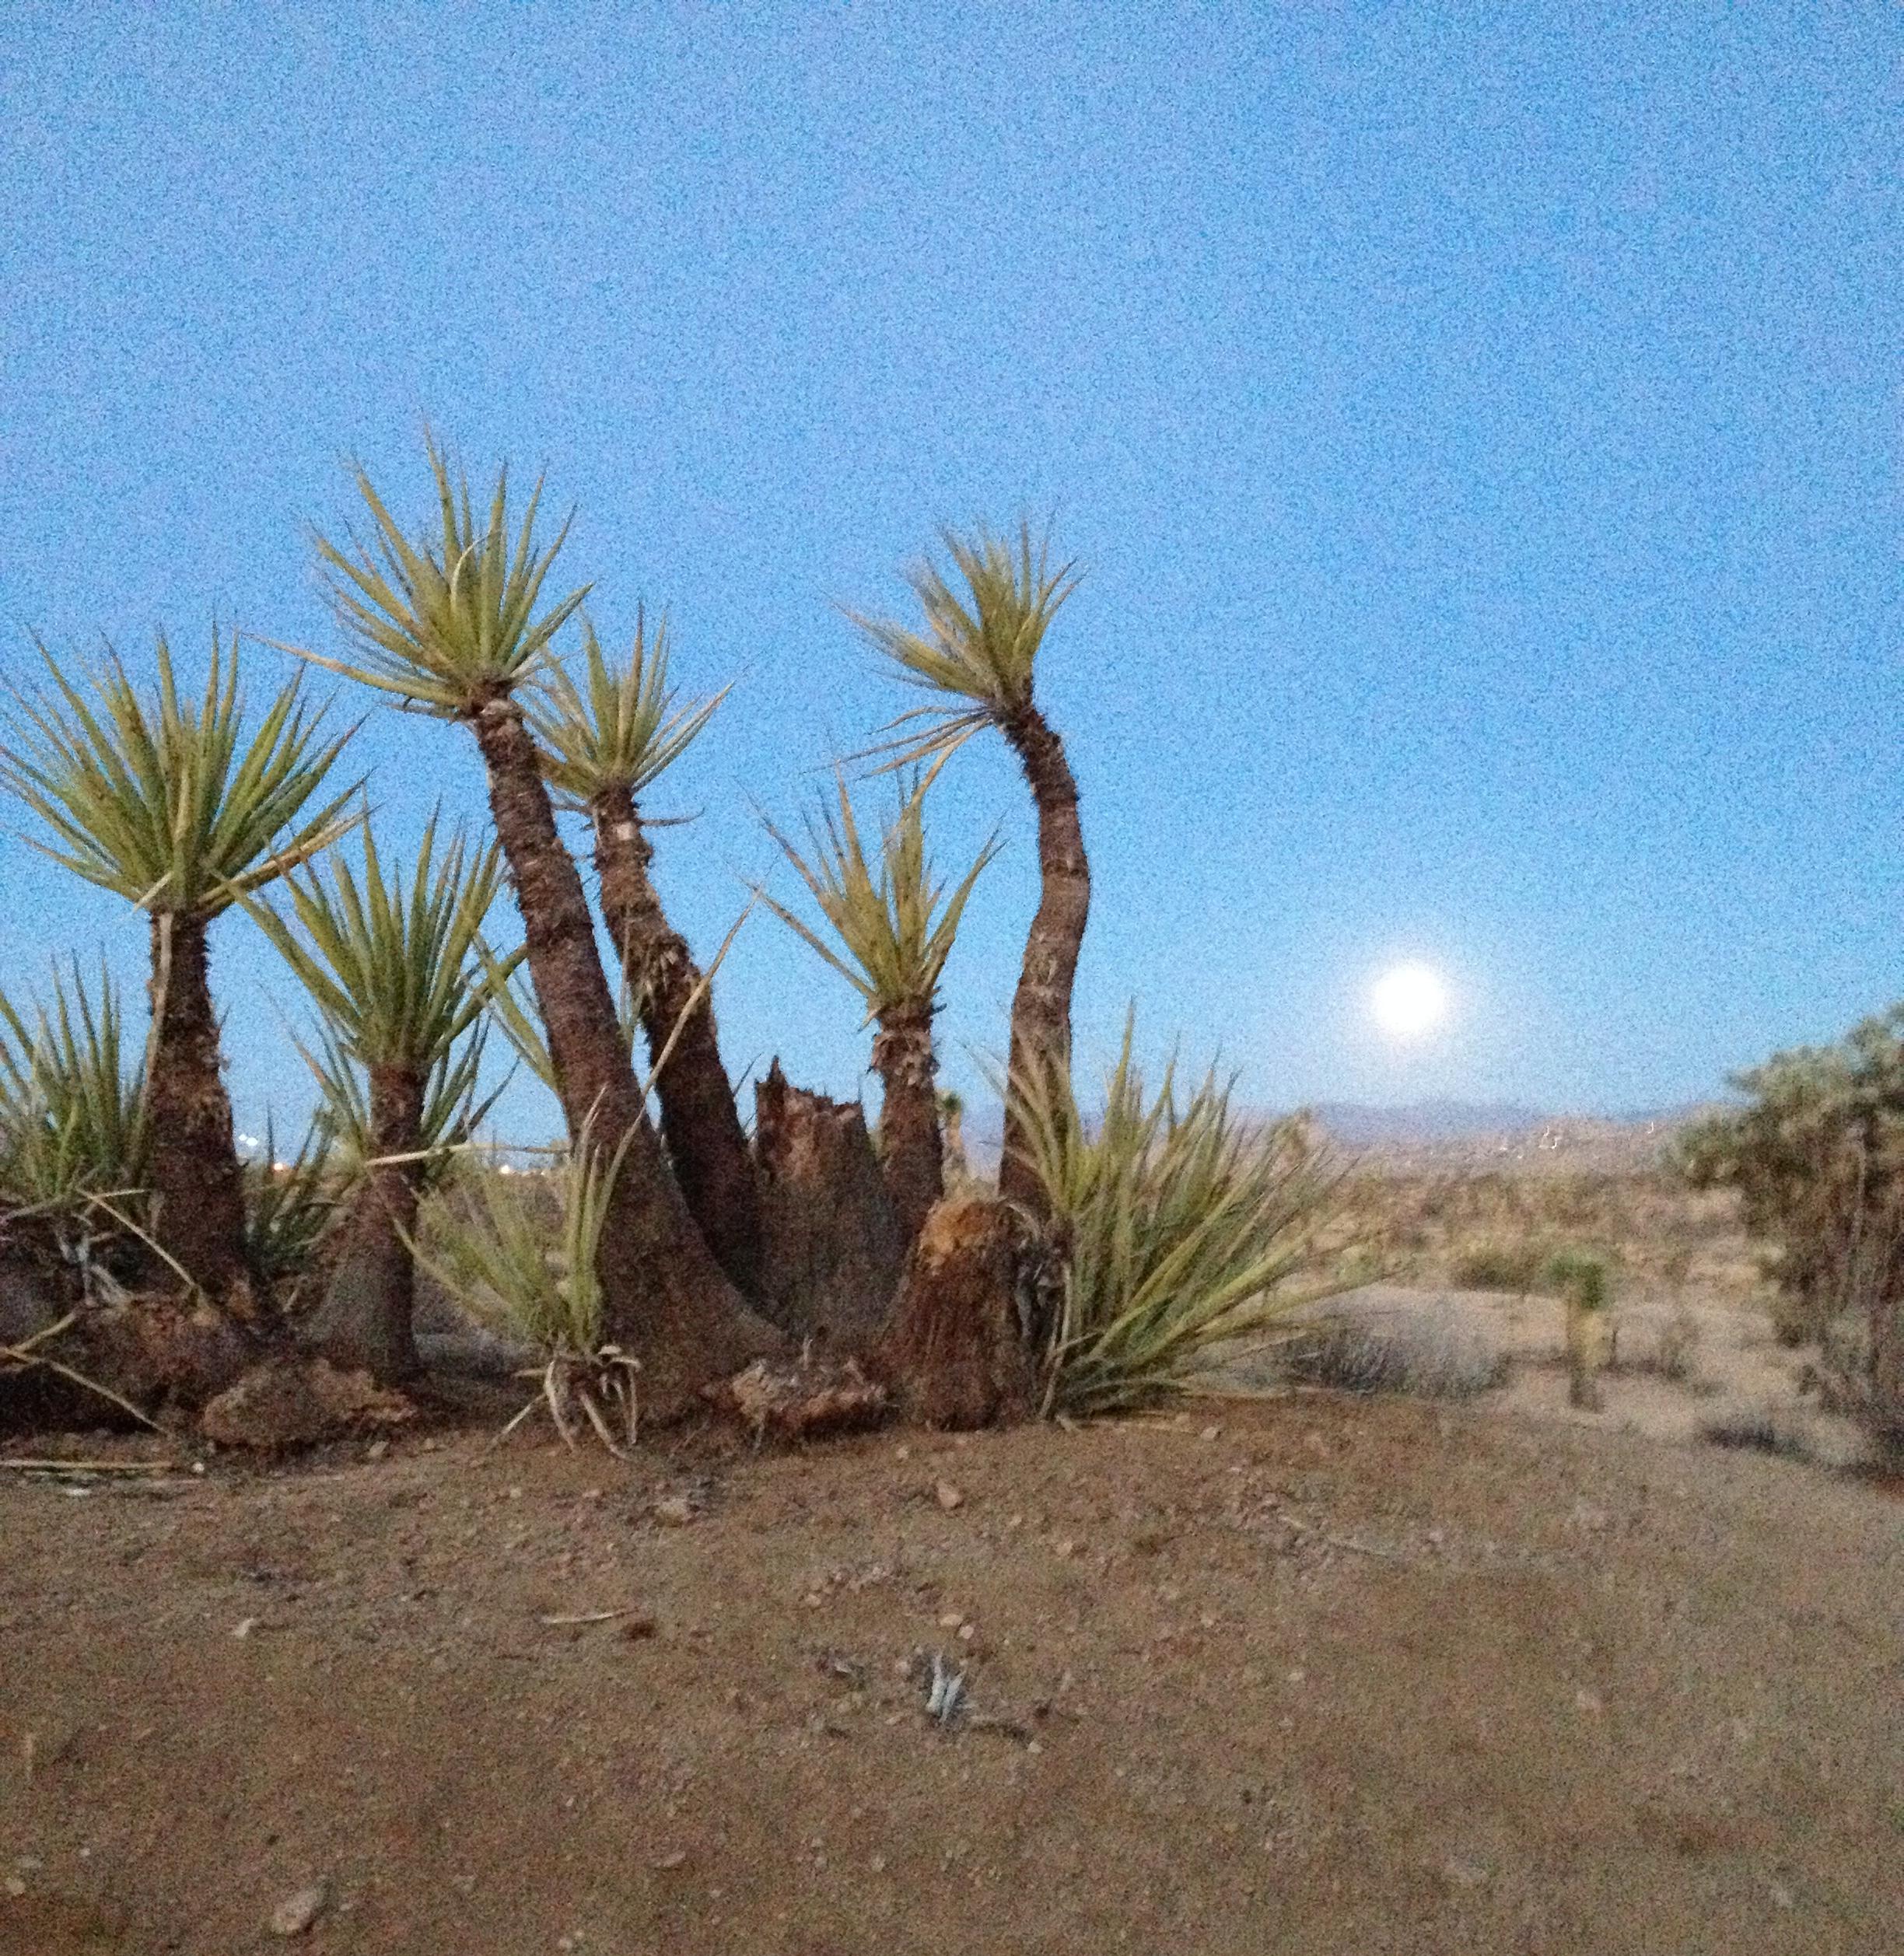 Moon setting. Oct 8, 2014 6:30am